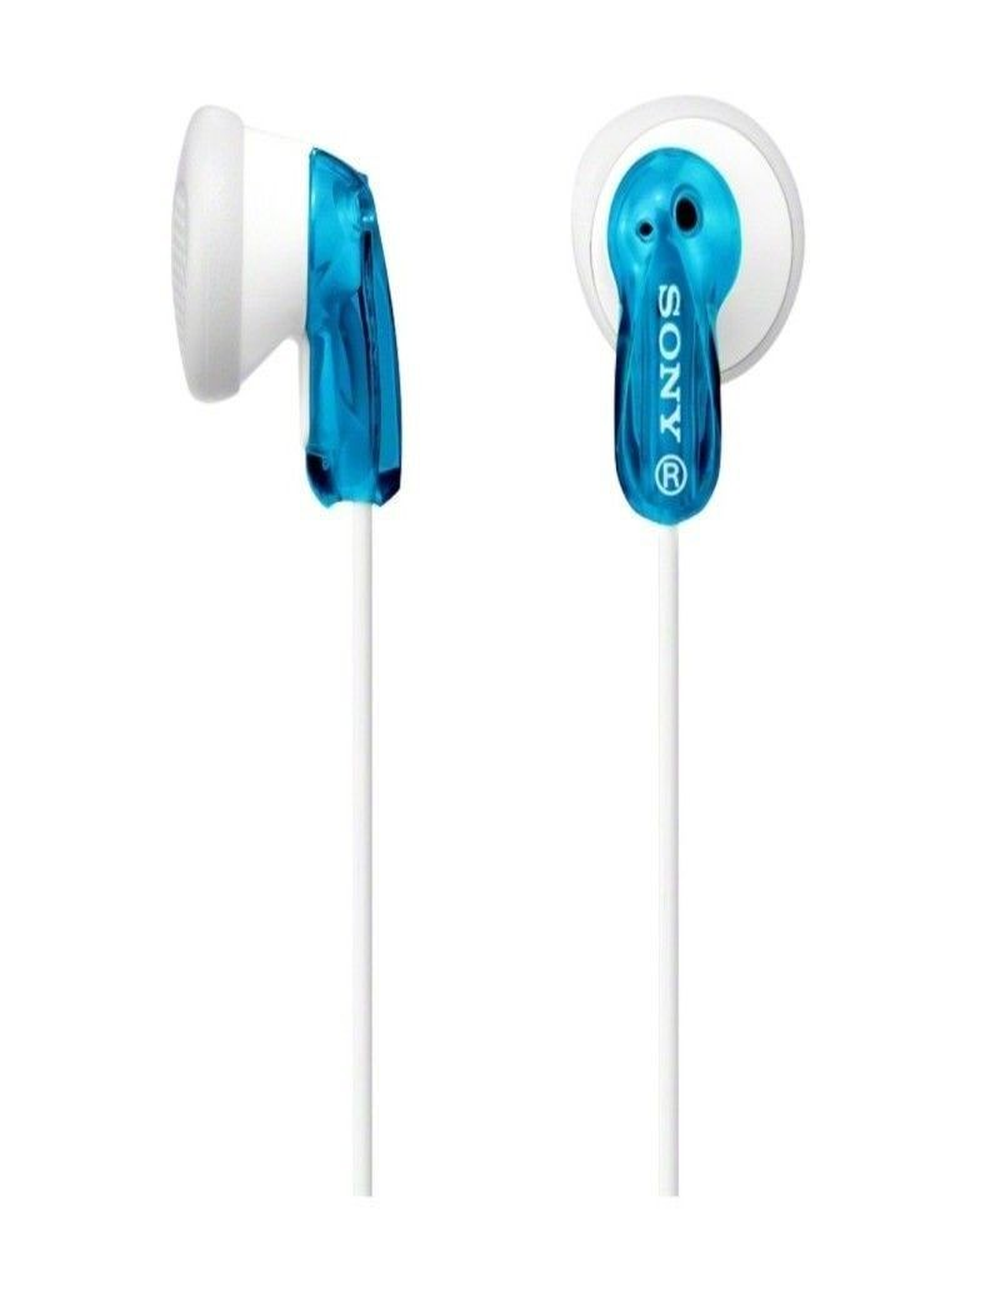 Auriculares botón SONY MDR-E9LP/L Azul Boton Clear Sound